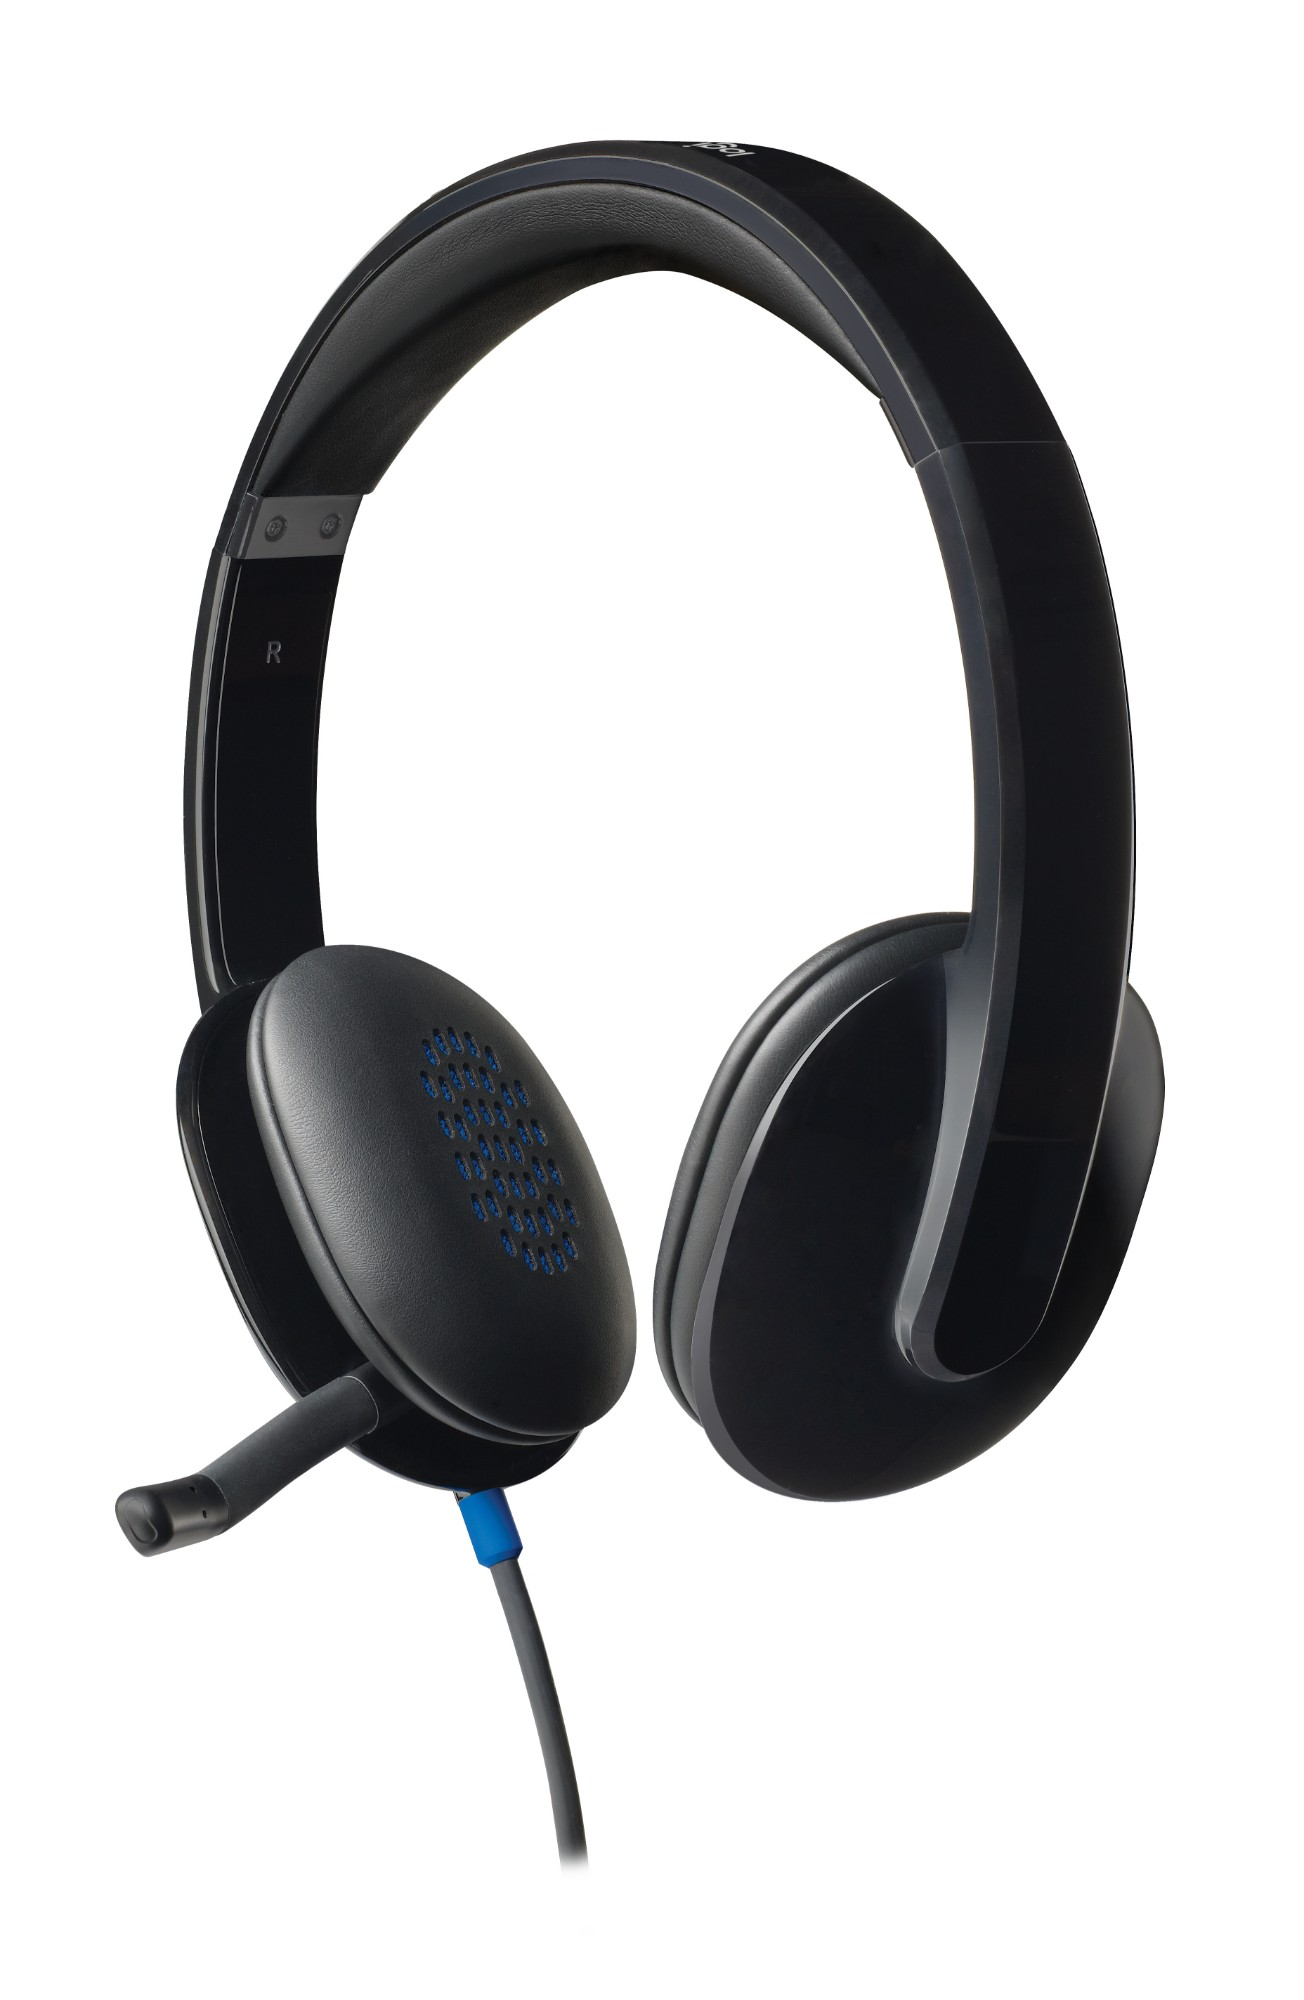 Logitech H540 Auriculares Diadema Negro